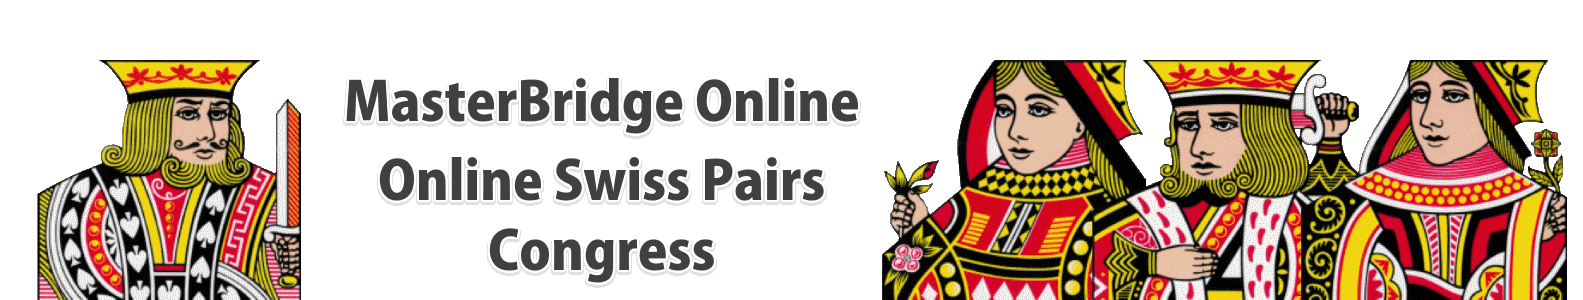 MasterBridge Online IMP Pairs Congress Information Page